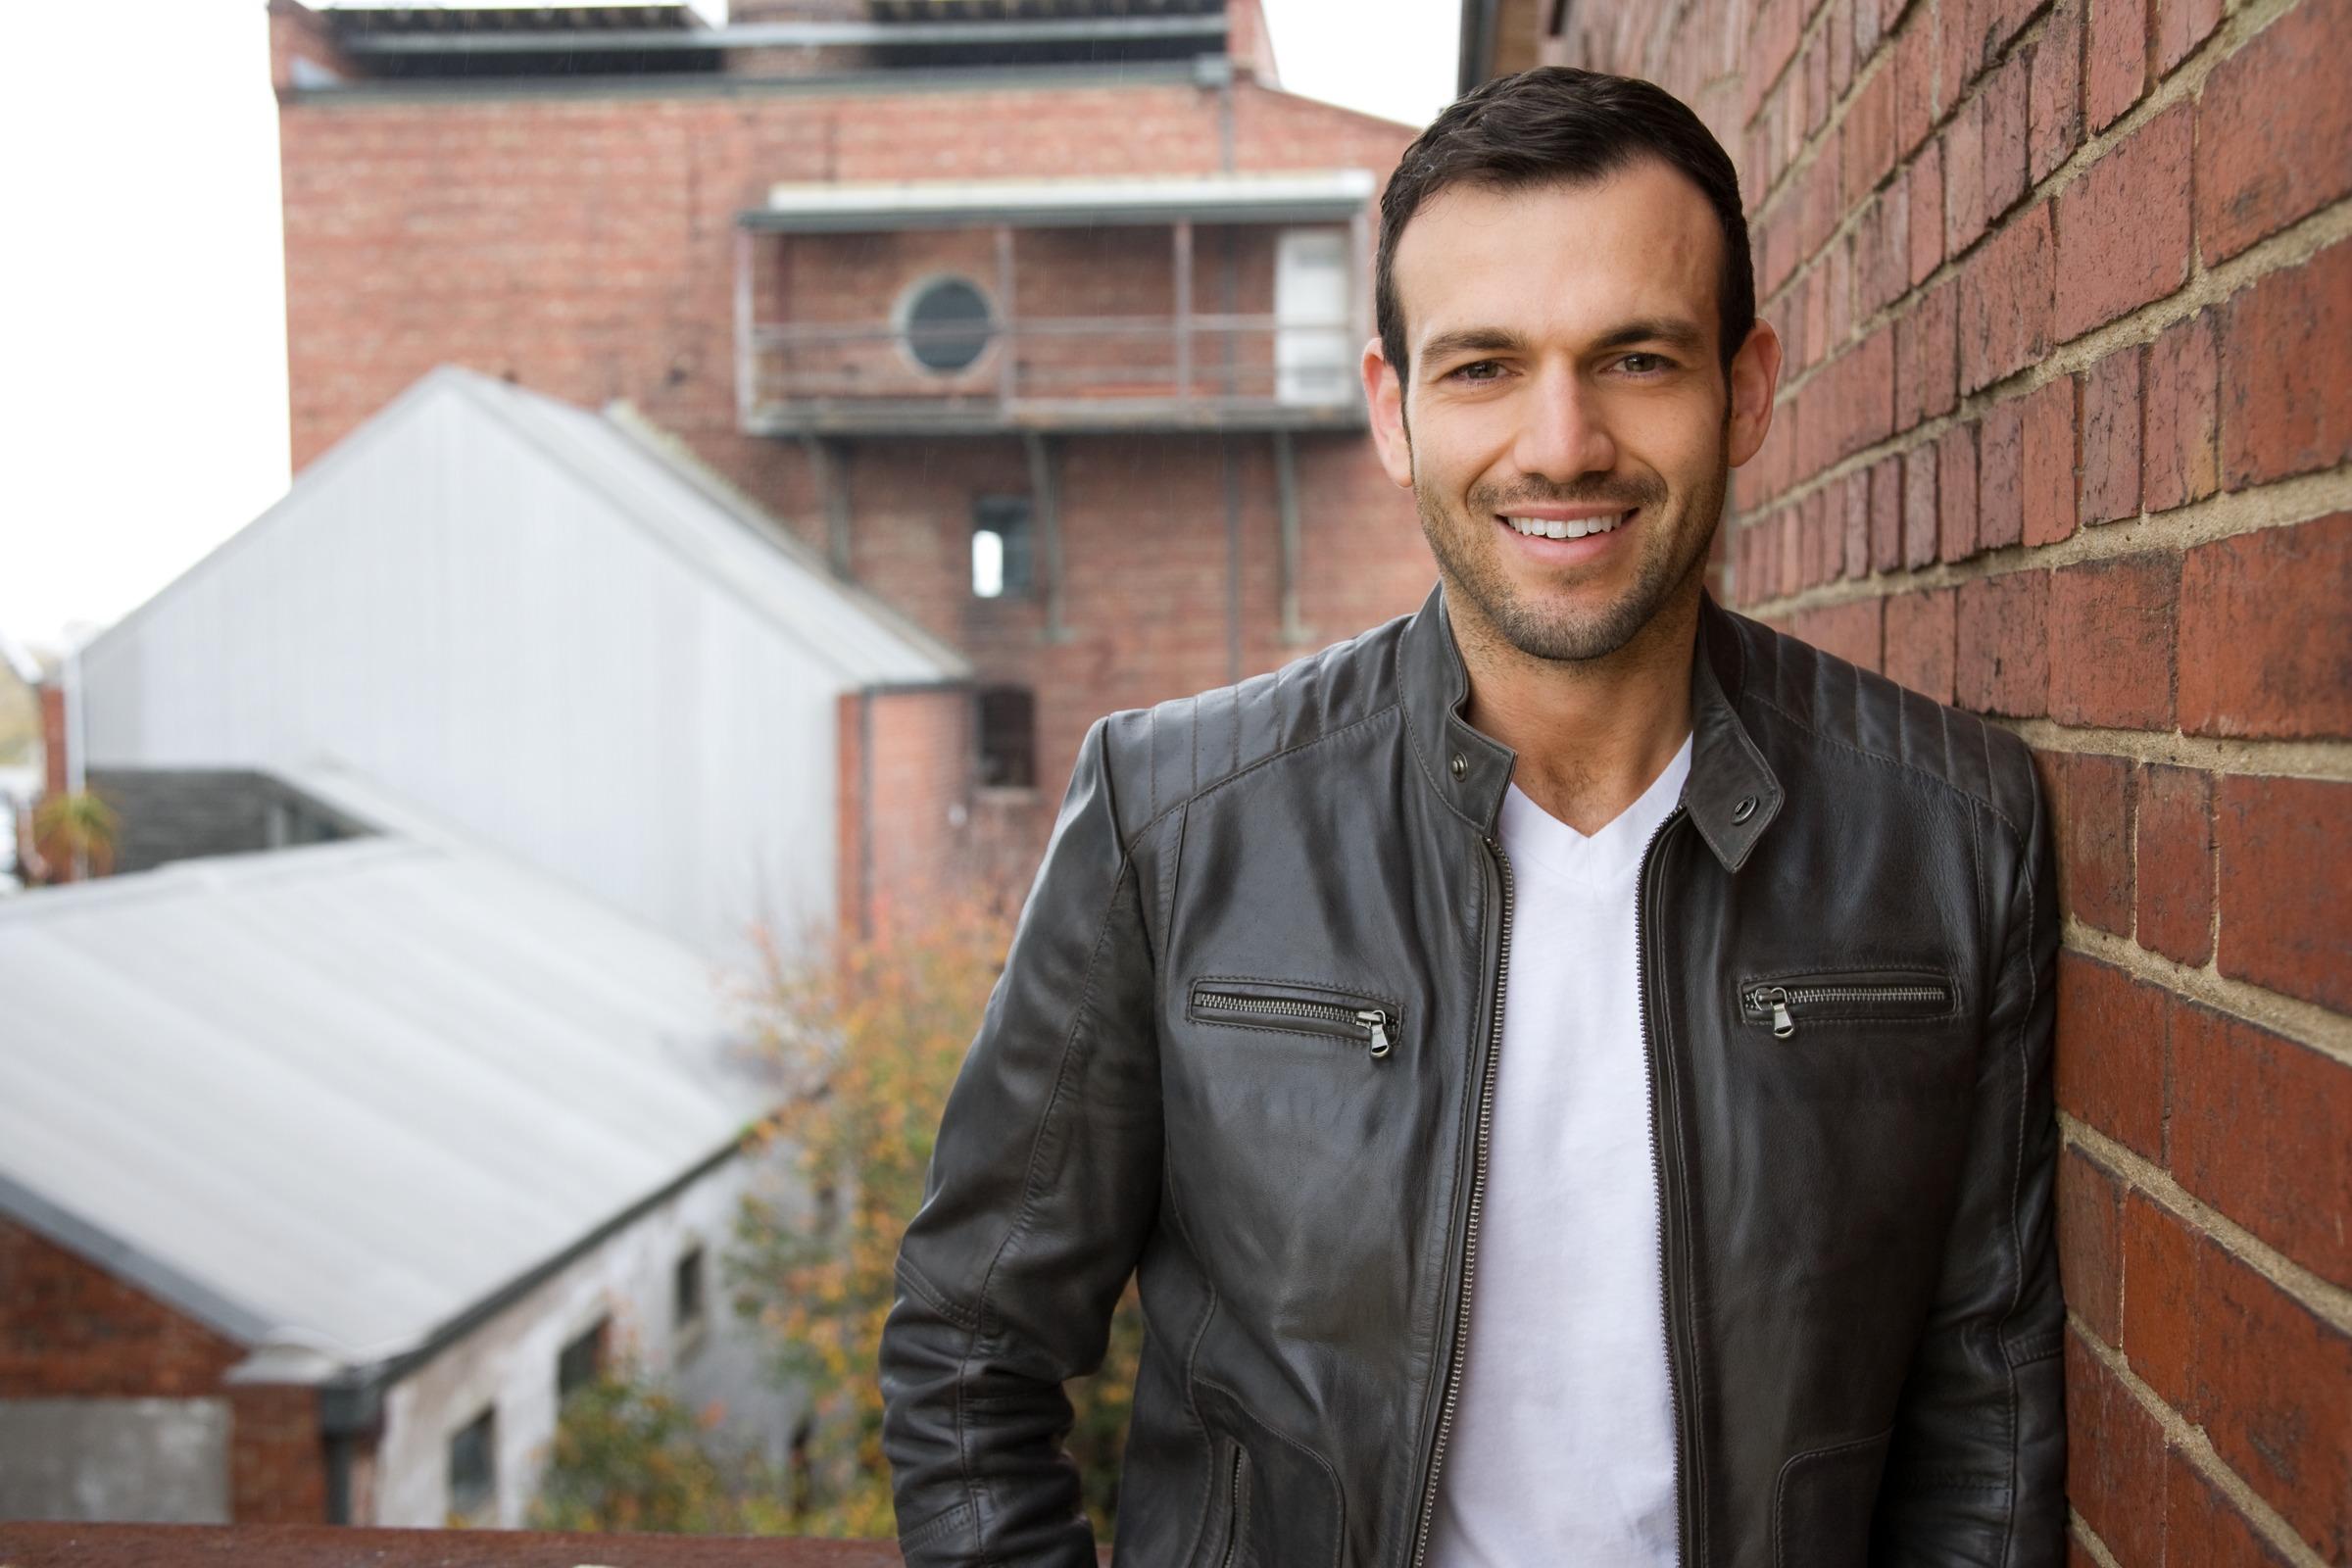 DailyJocks.com founder Nicholas Egonidis